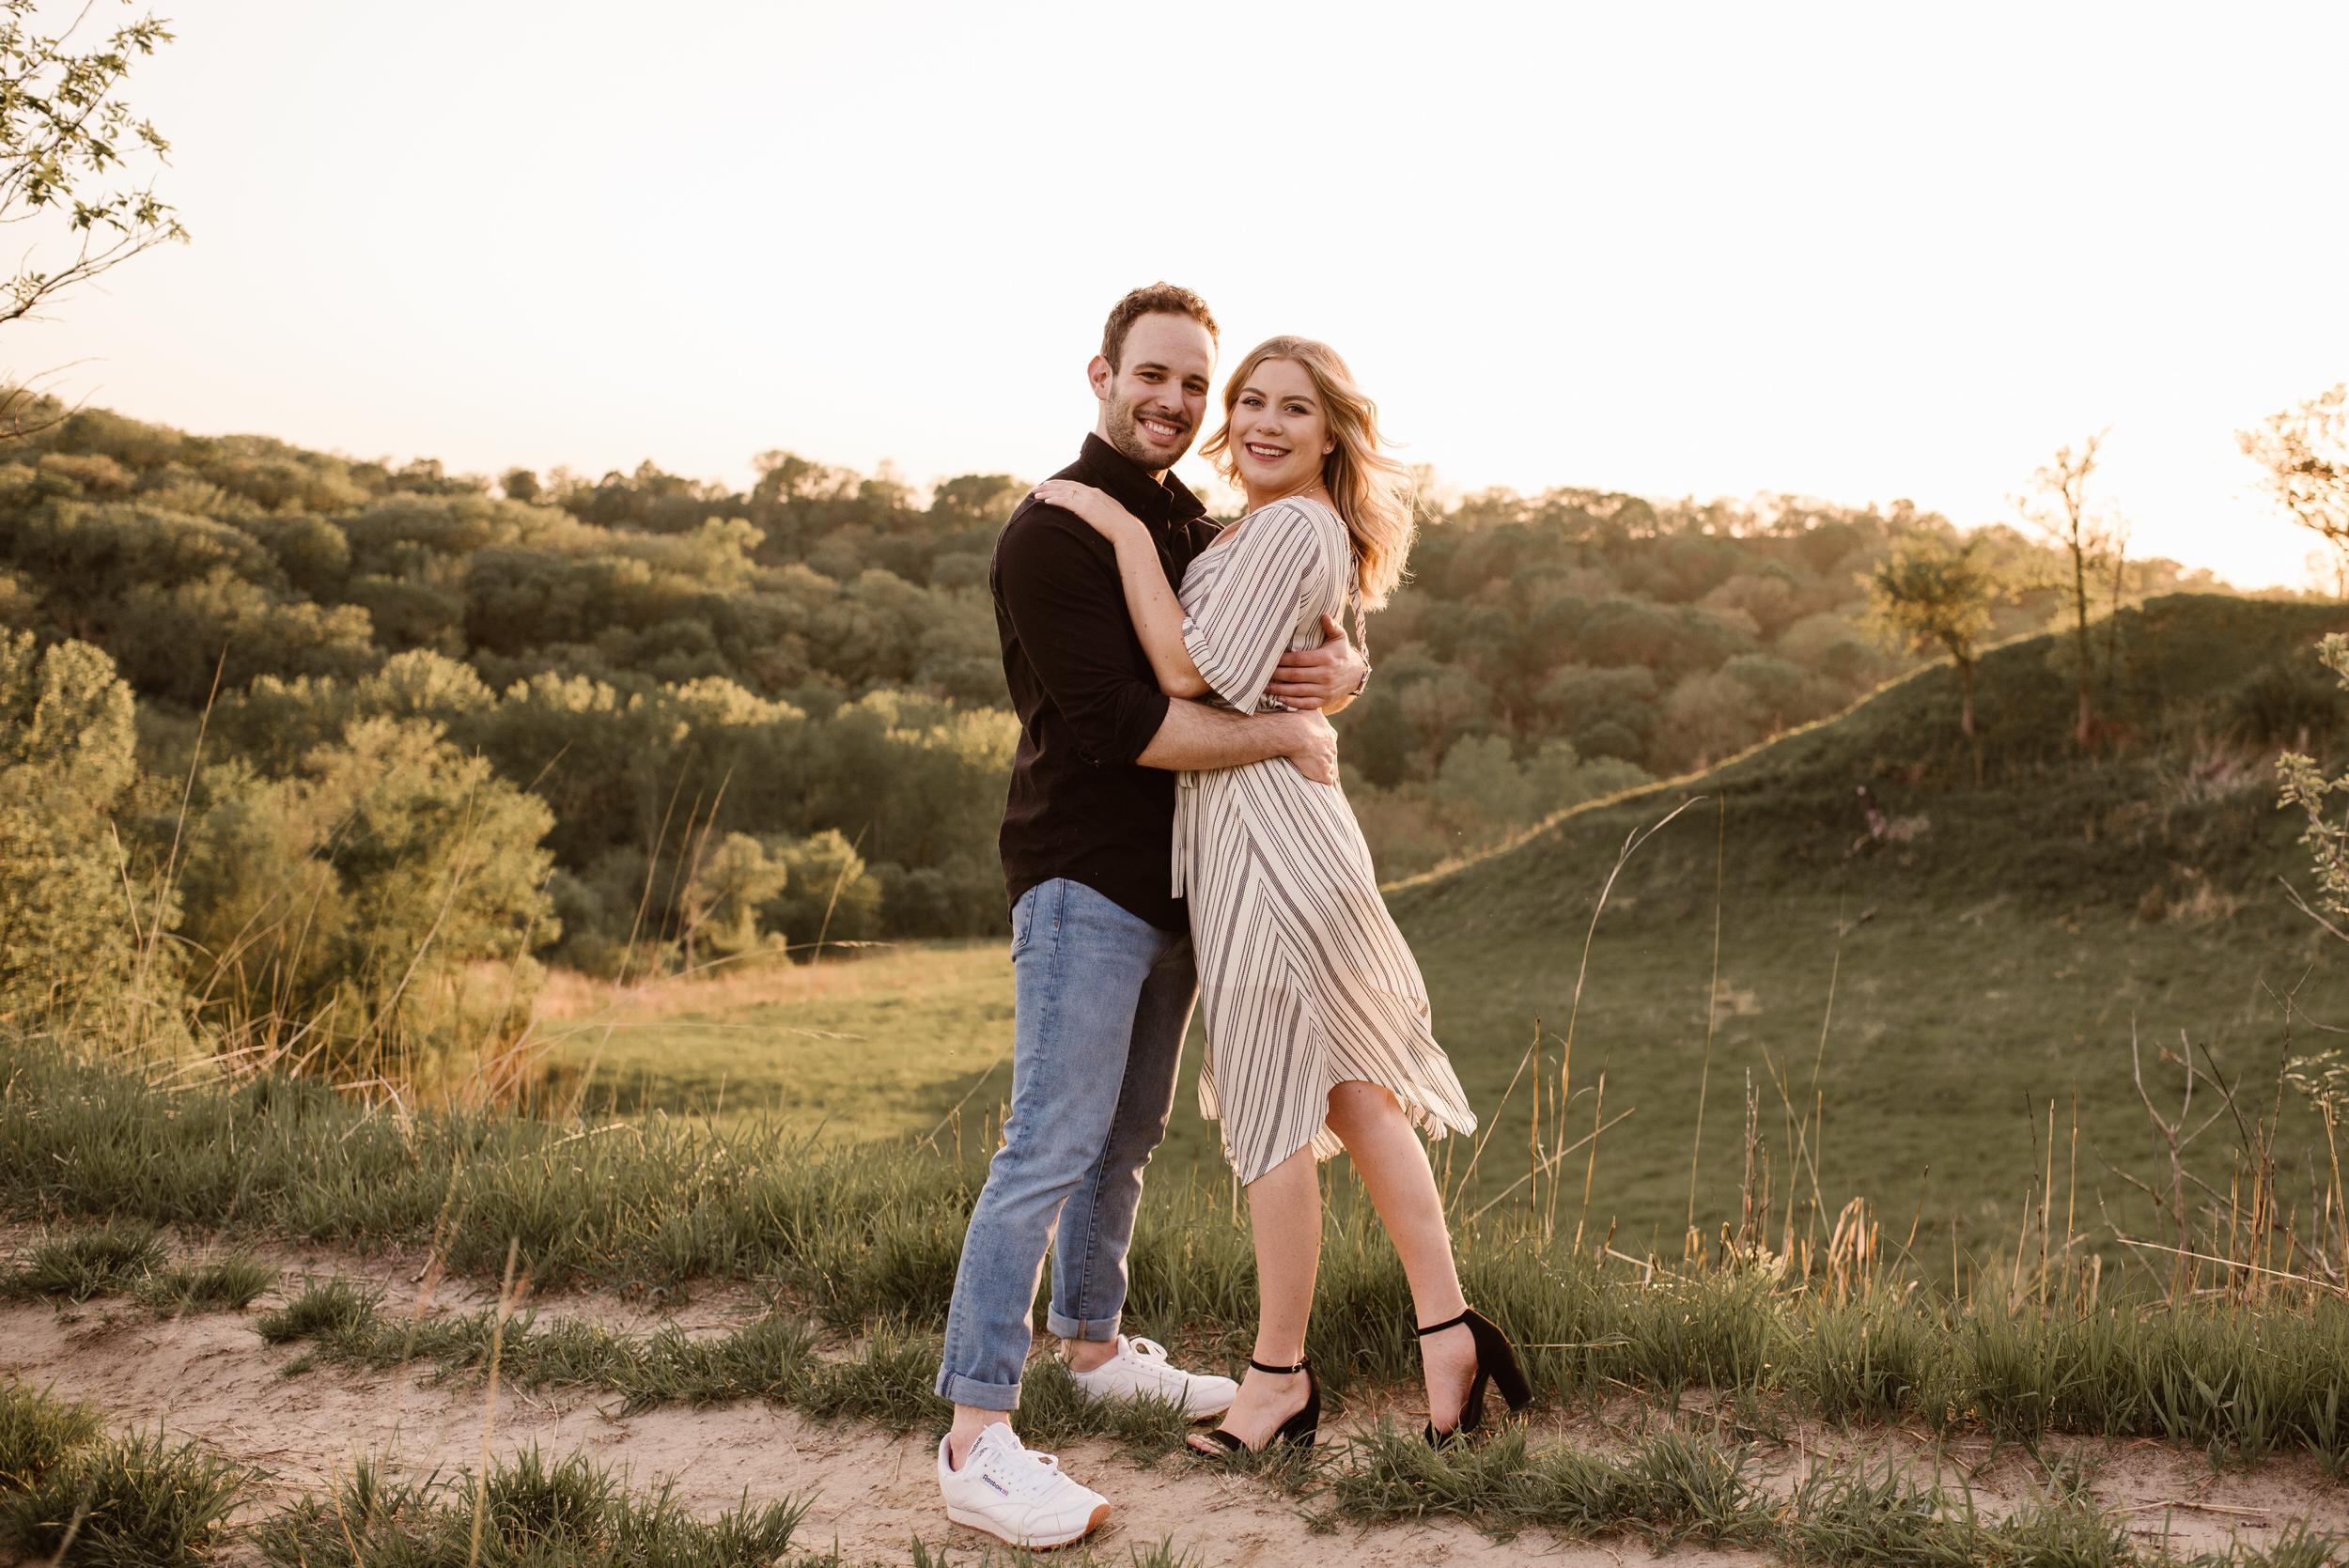 Omaha-Nebraska-Engagement-Session-Kaylie-Sirek-Photography-131.jpg